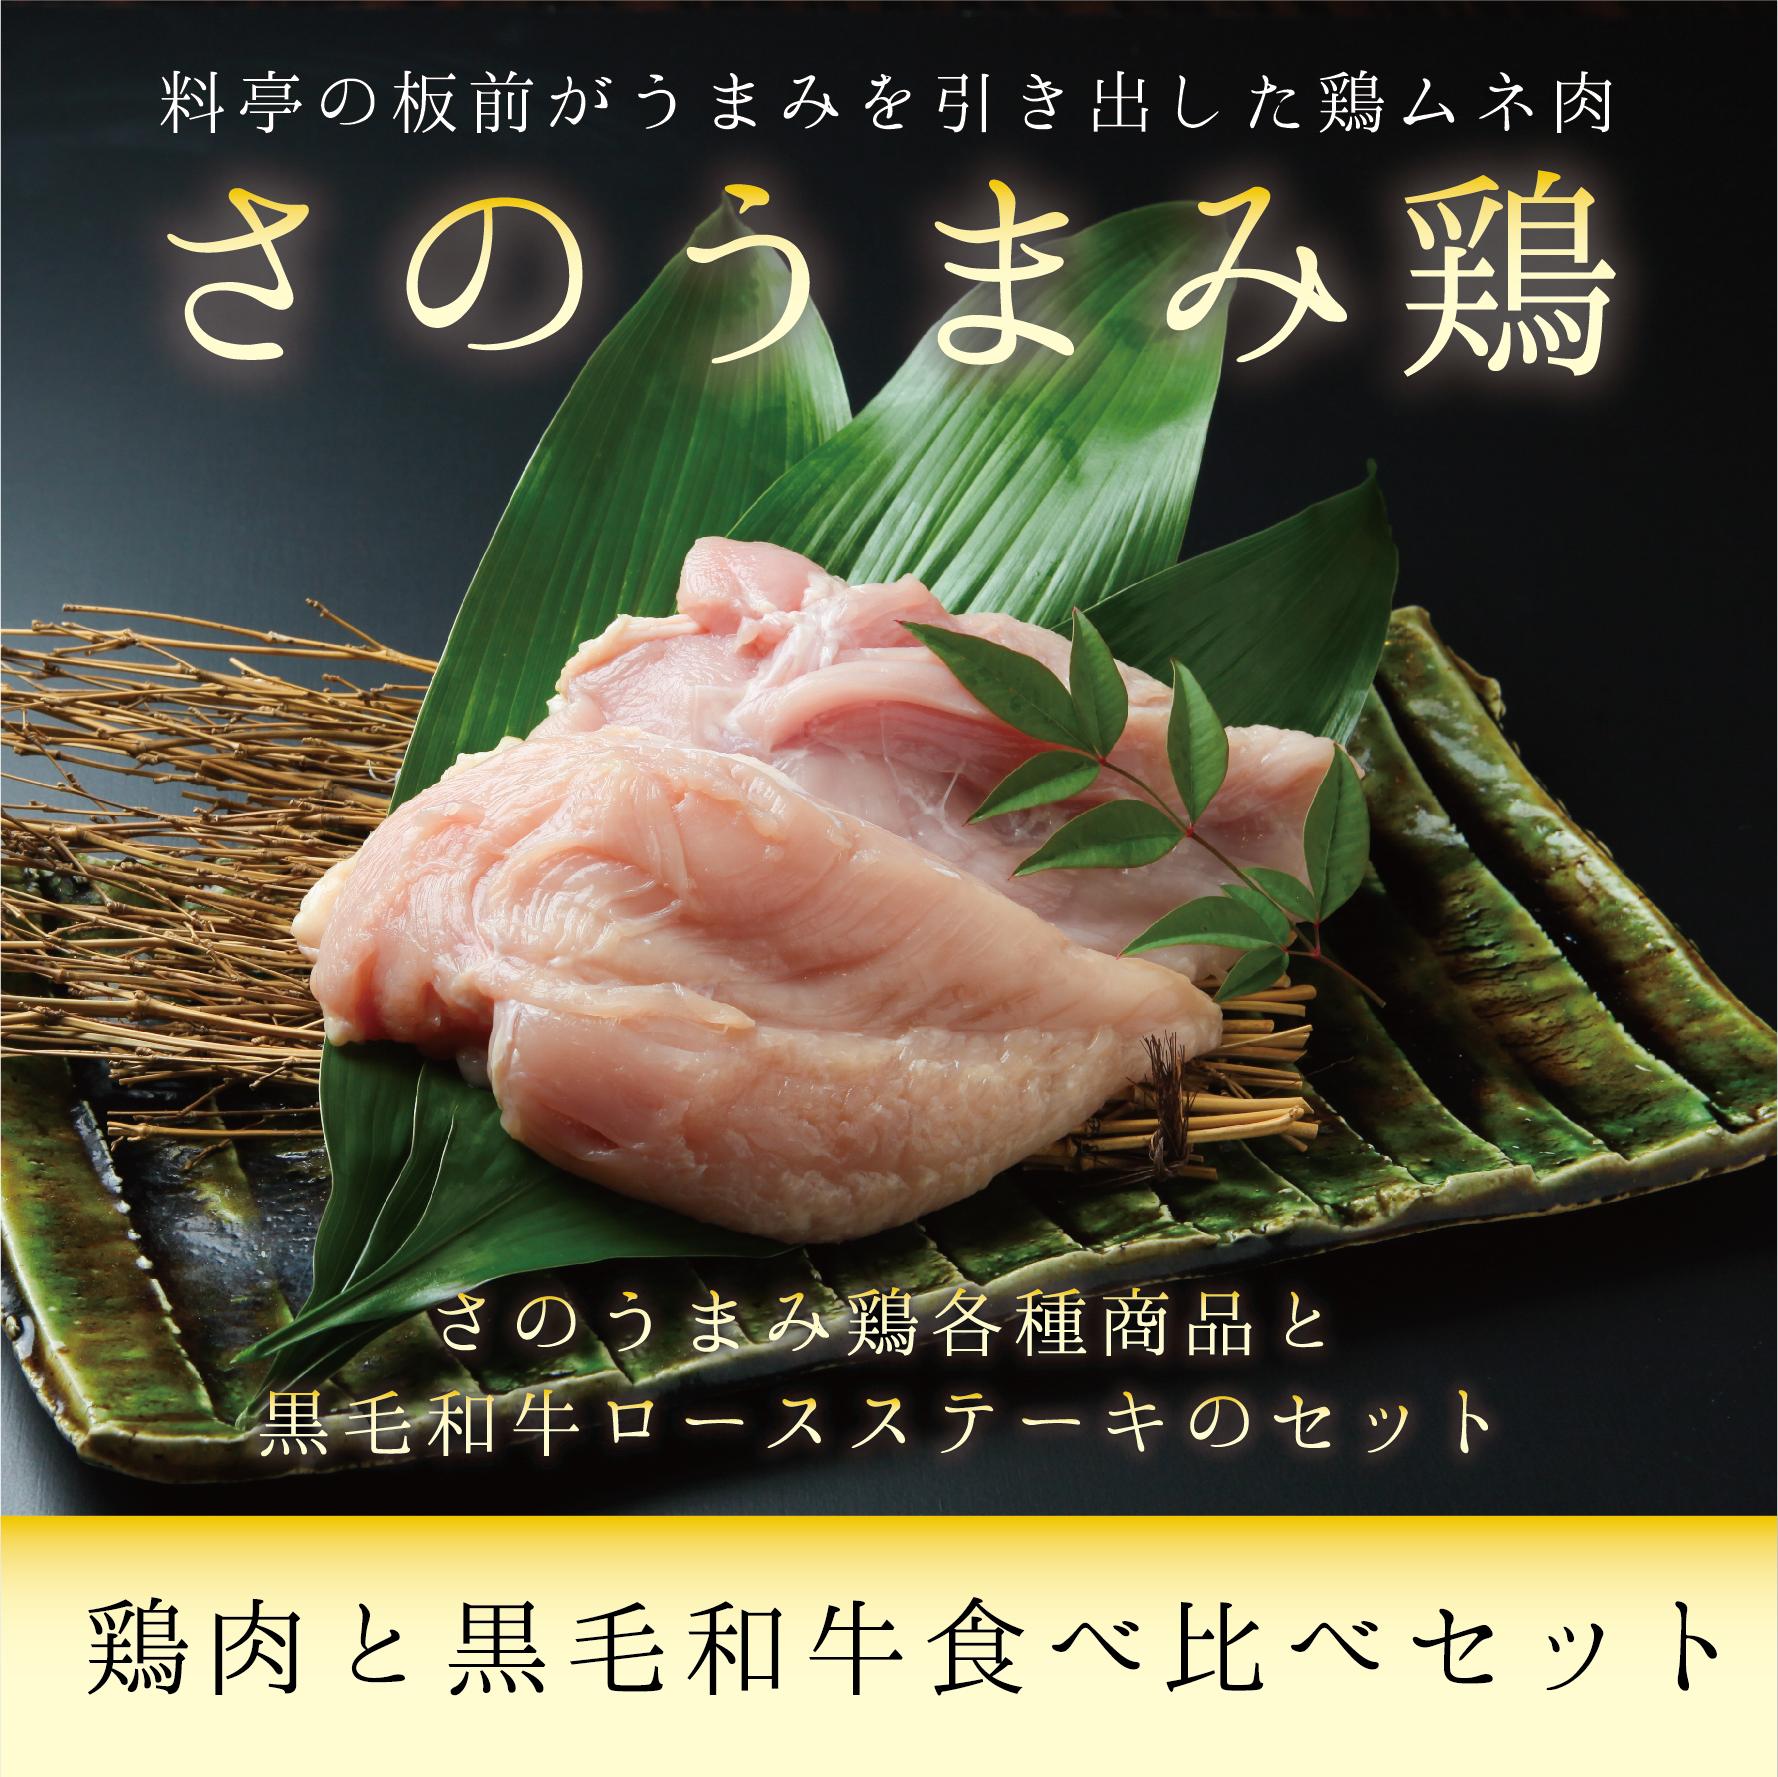 G061 さのうまみ鶏・黒毛和牛豪華食べ比べセット(精肉2kg+唐揚げ2kg+ミンチ2kg+黒毛和牛計360g)